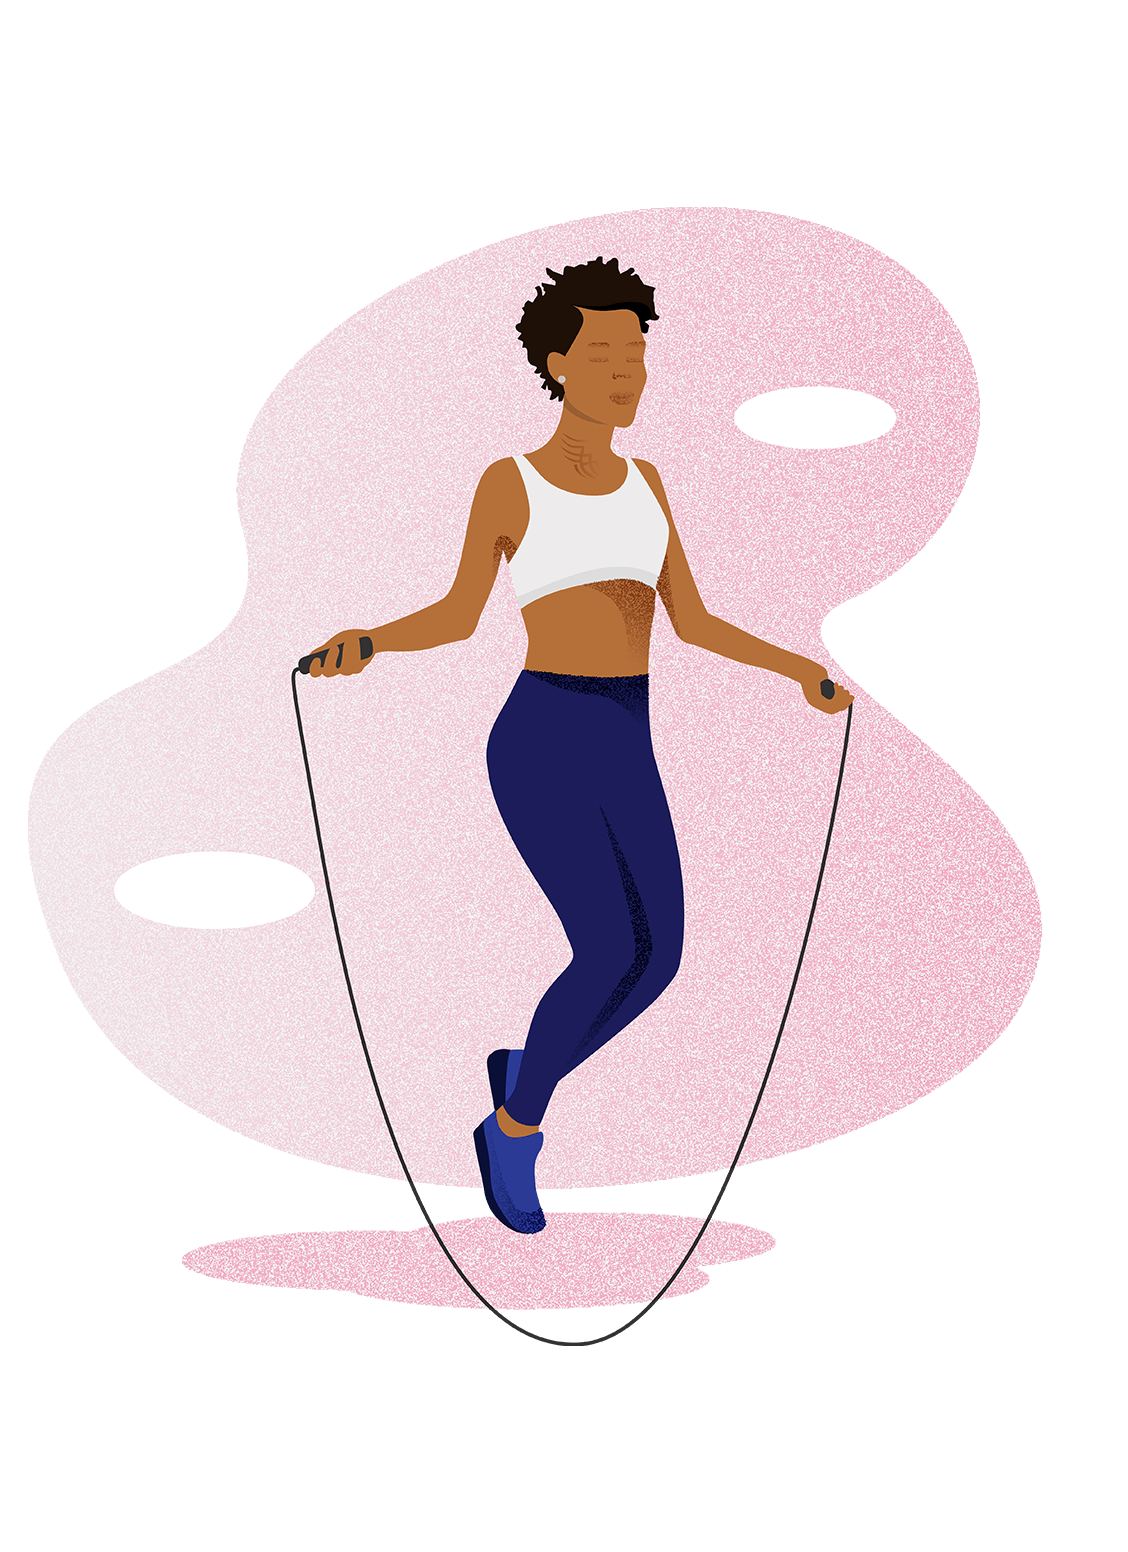 A black woman jump roping